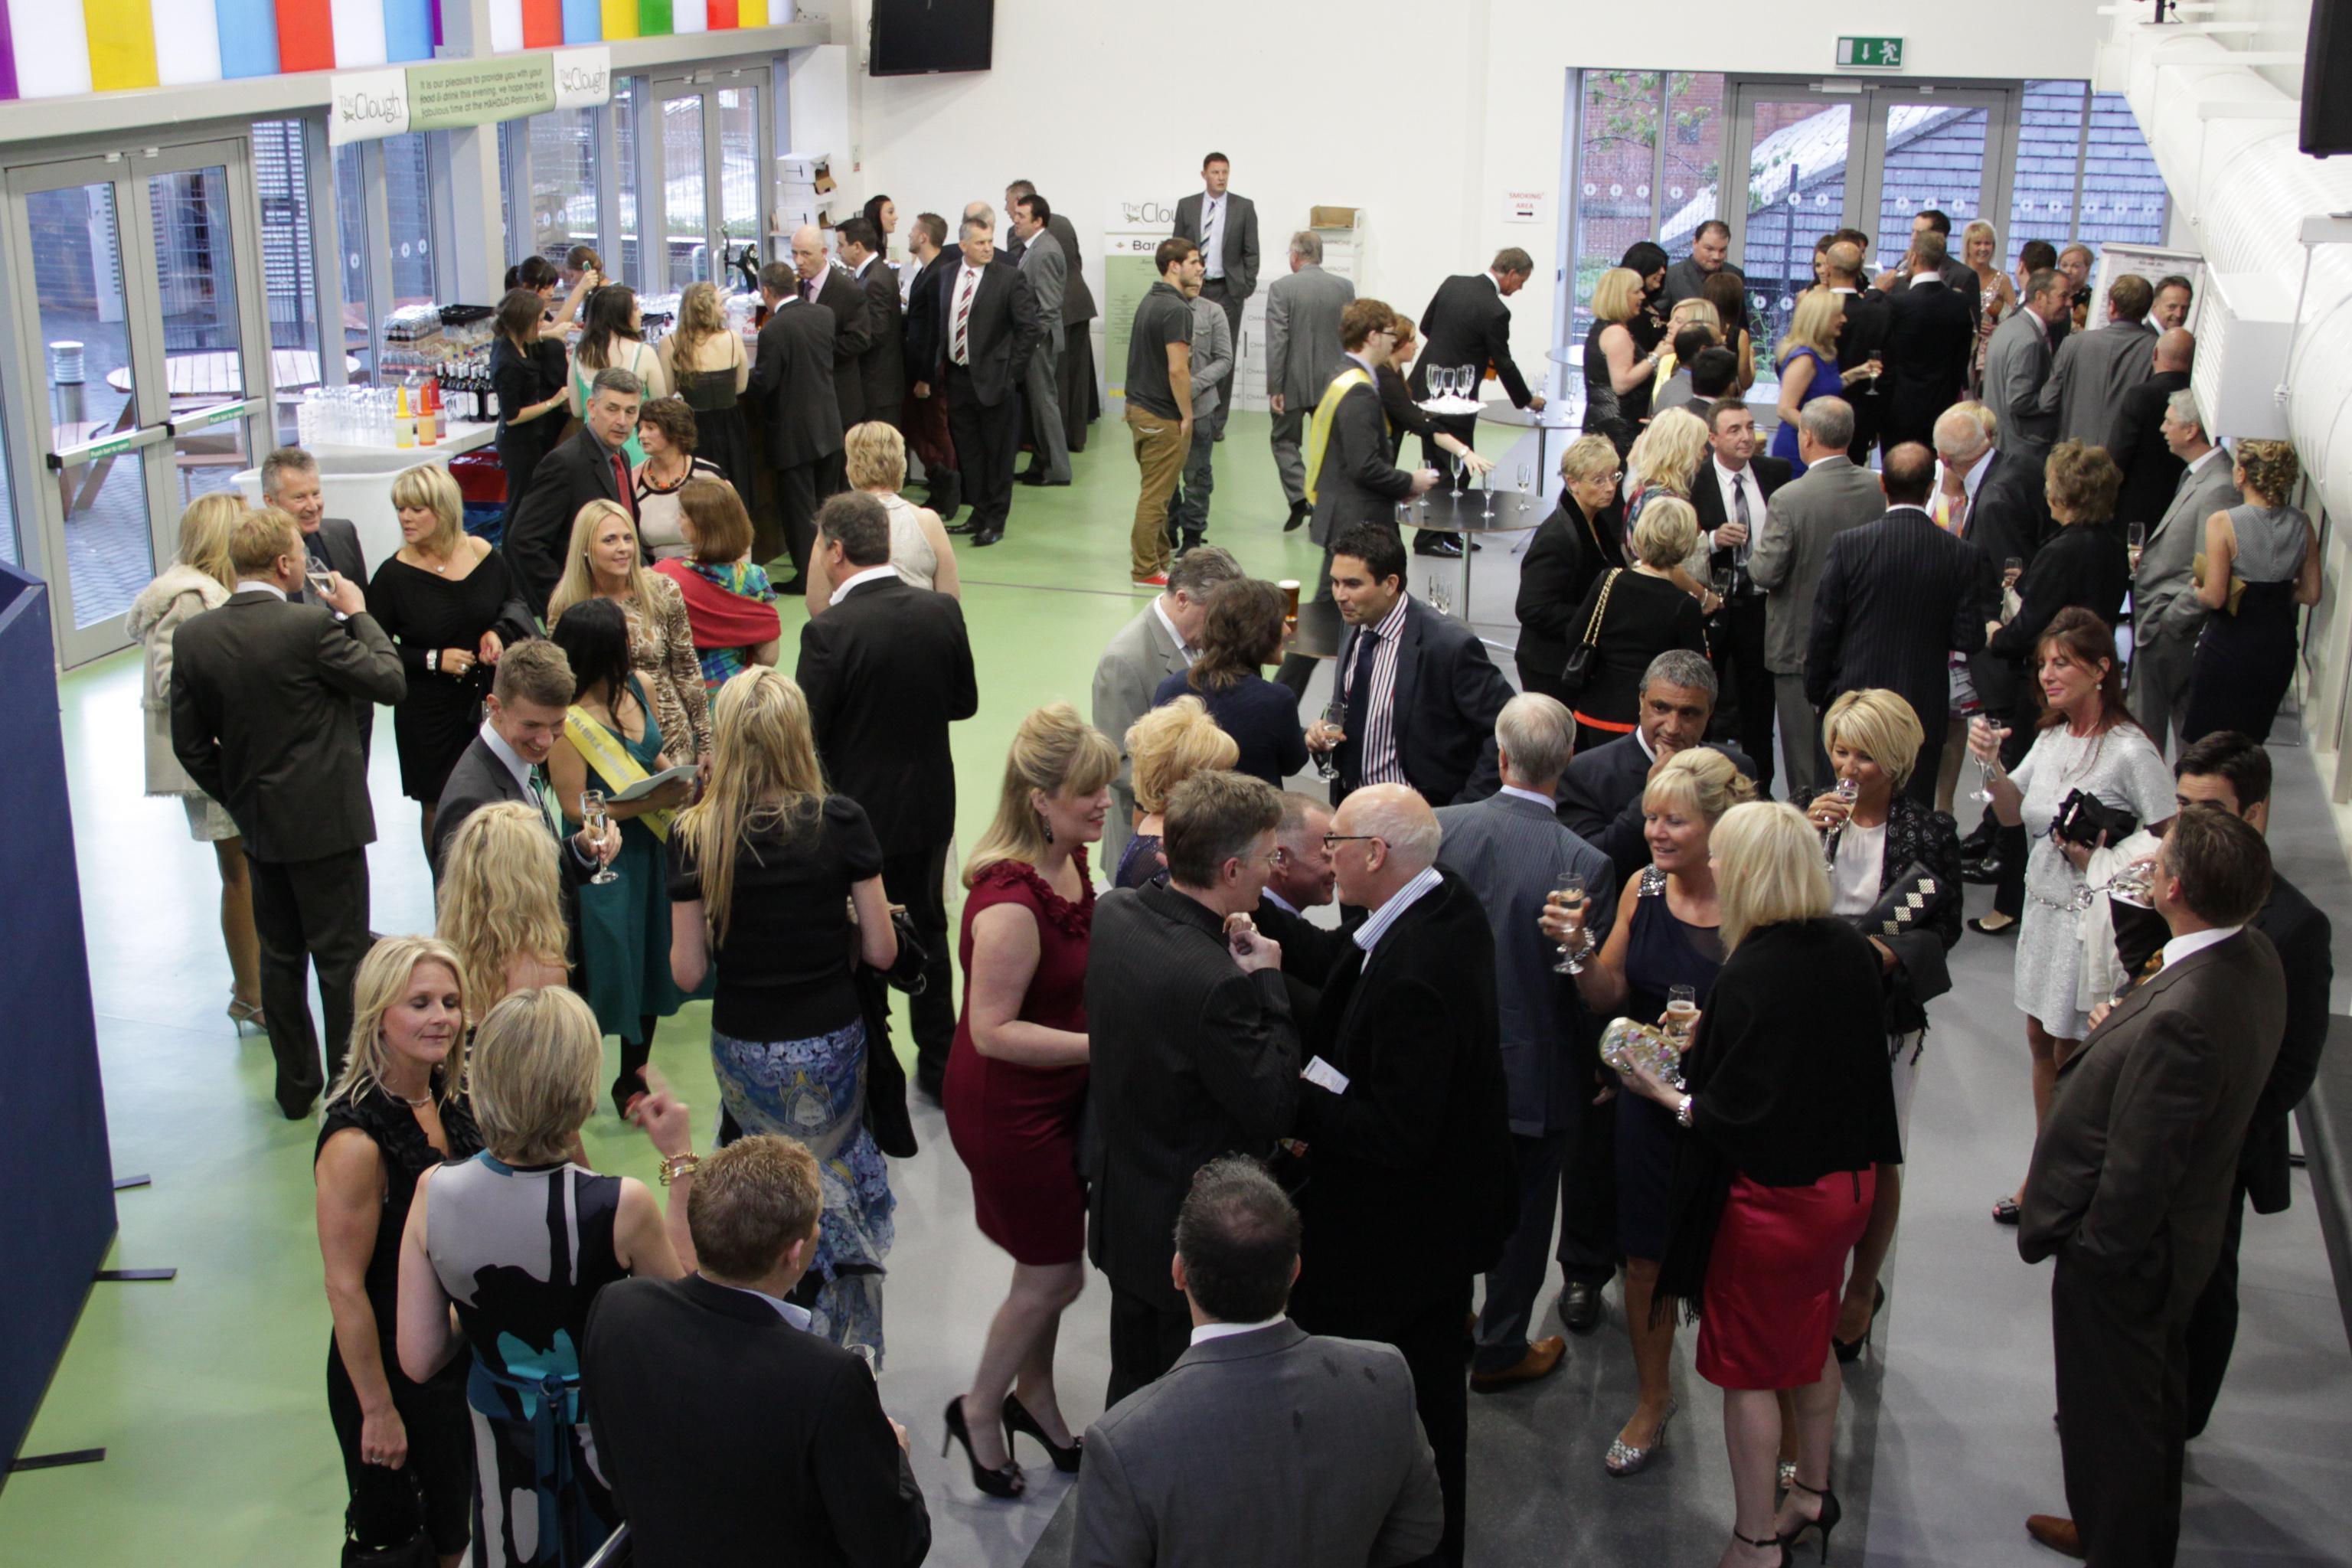 Conferences Entrepreneurs Should Attend In 2014